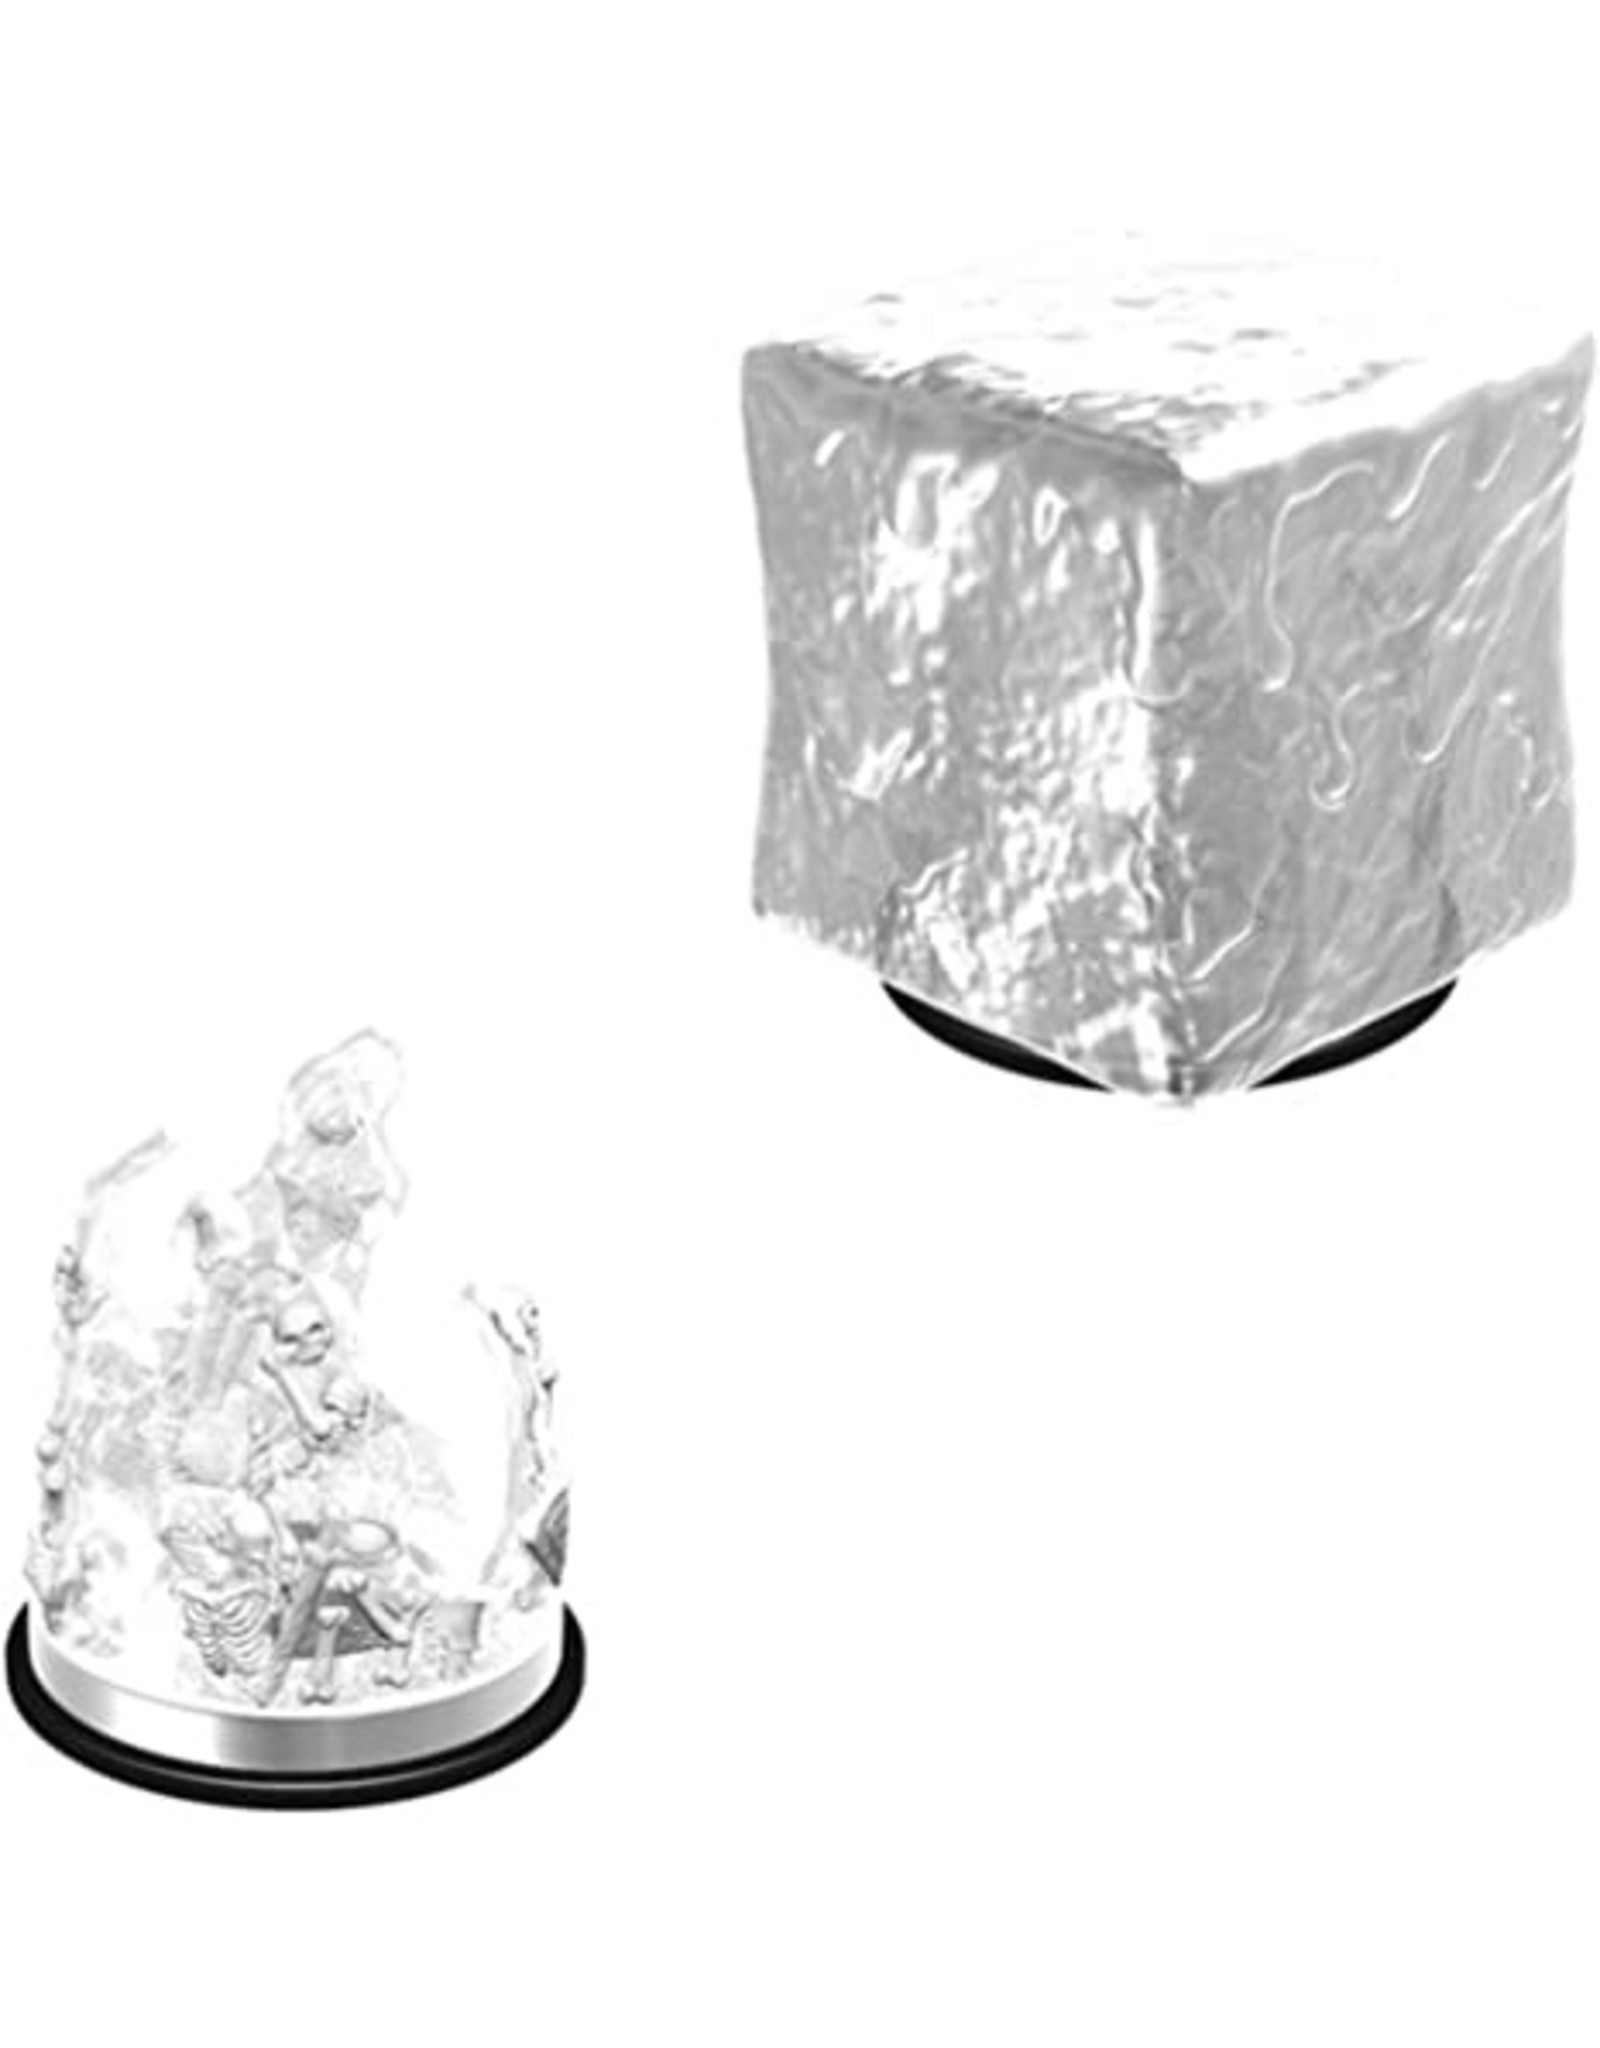 Wiz Kids D&D NMU: Gelatinous Cube W6 LTD